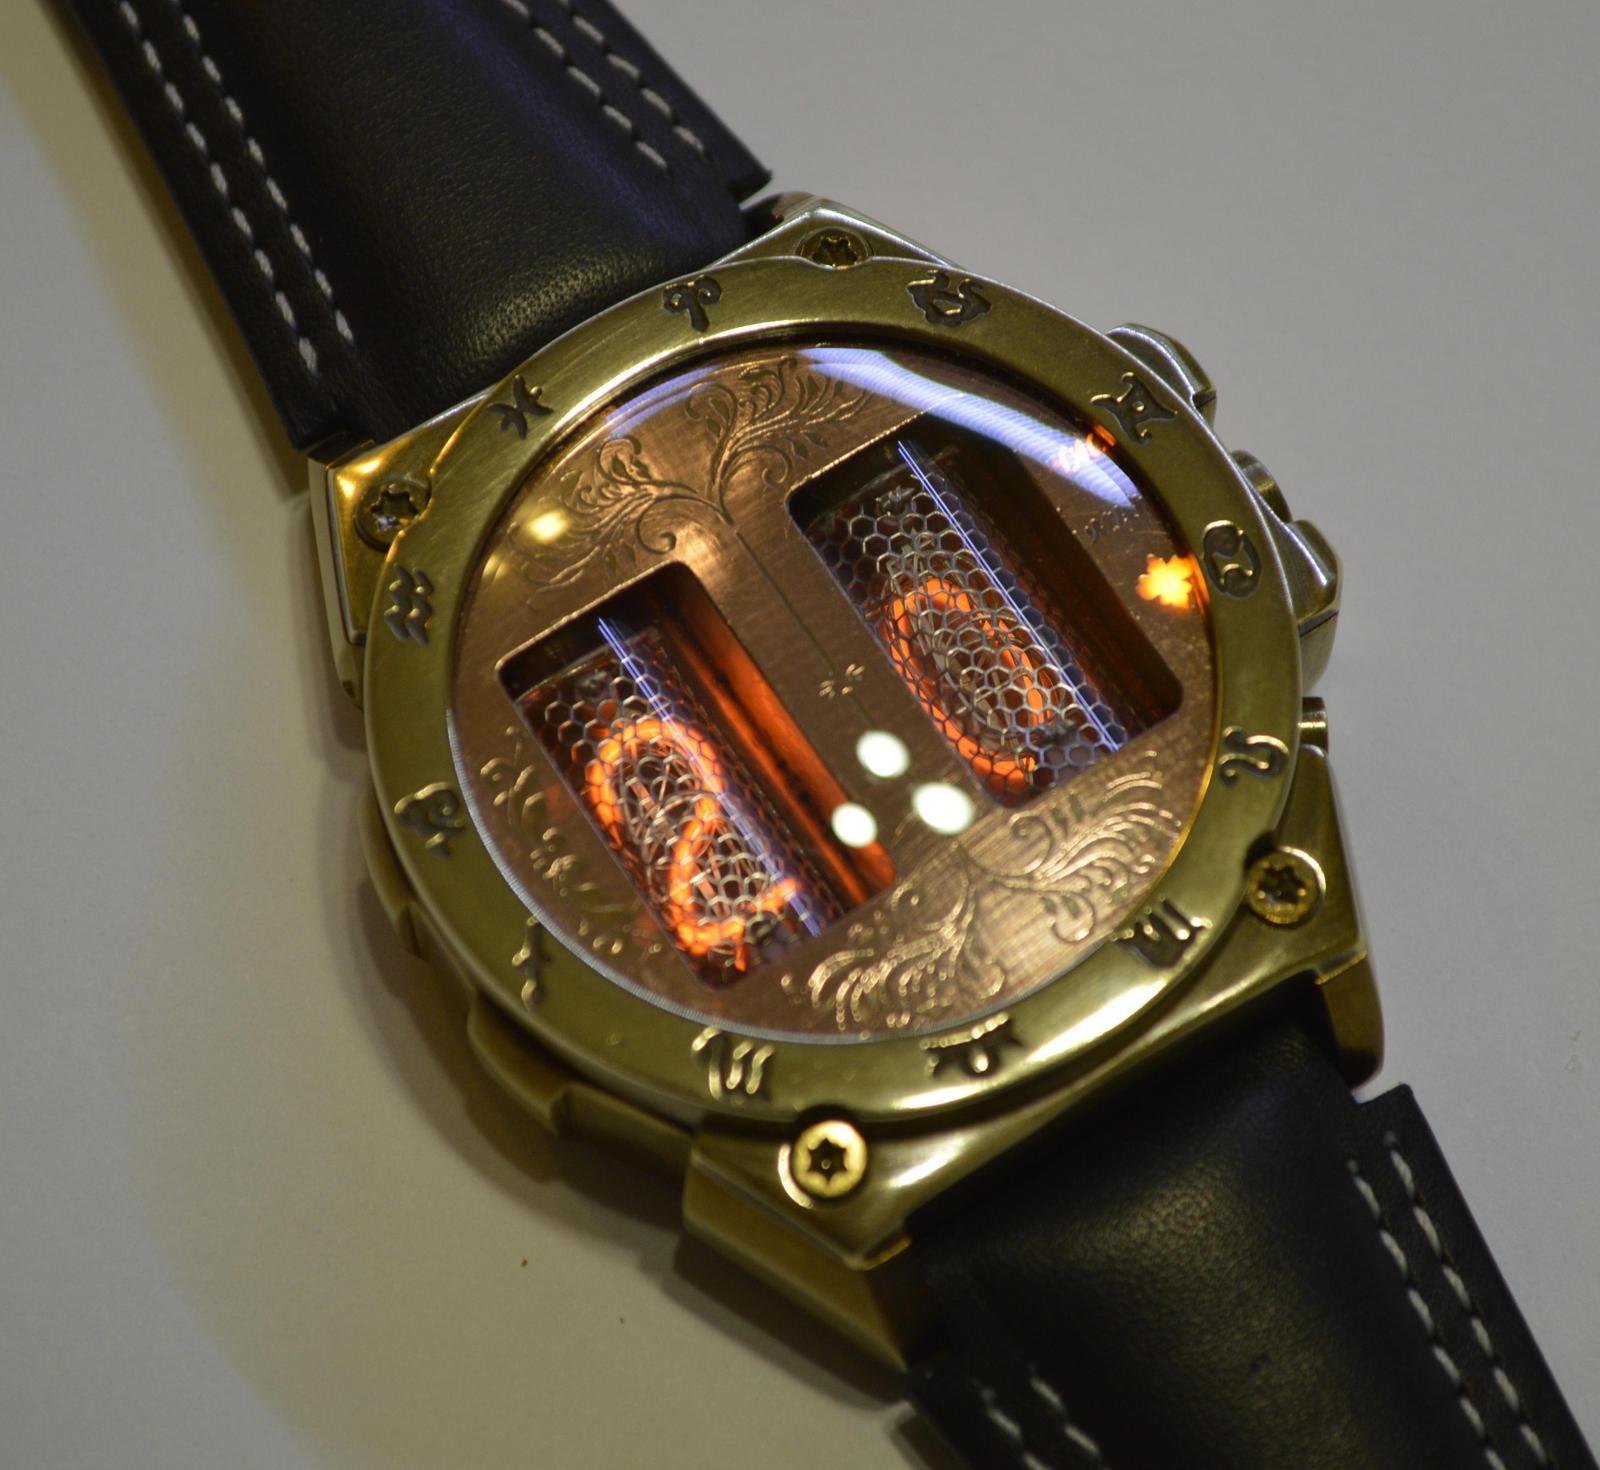 Умные часы своими руками за 1500 рублей / Geektimes 3